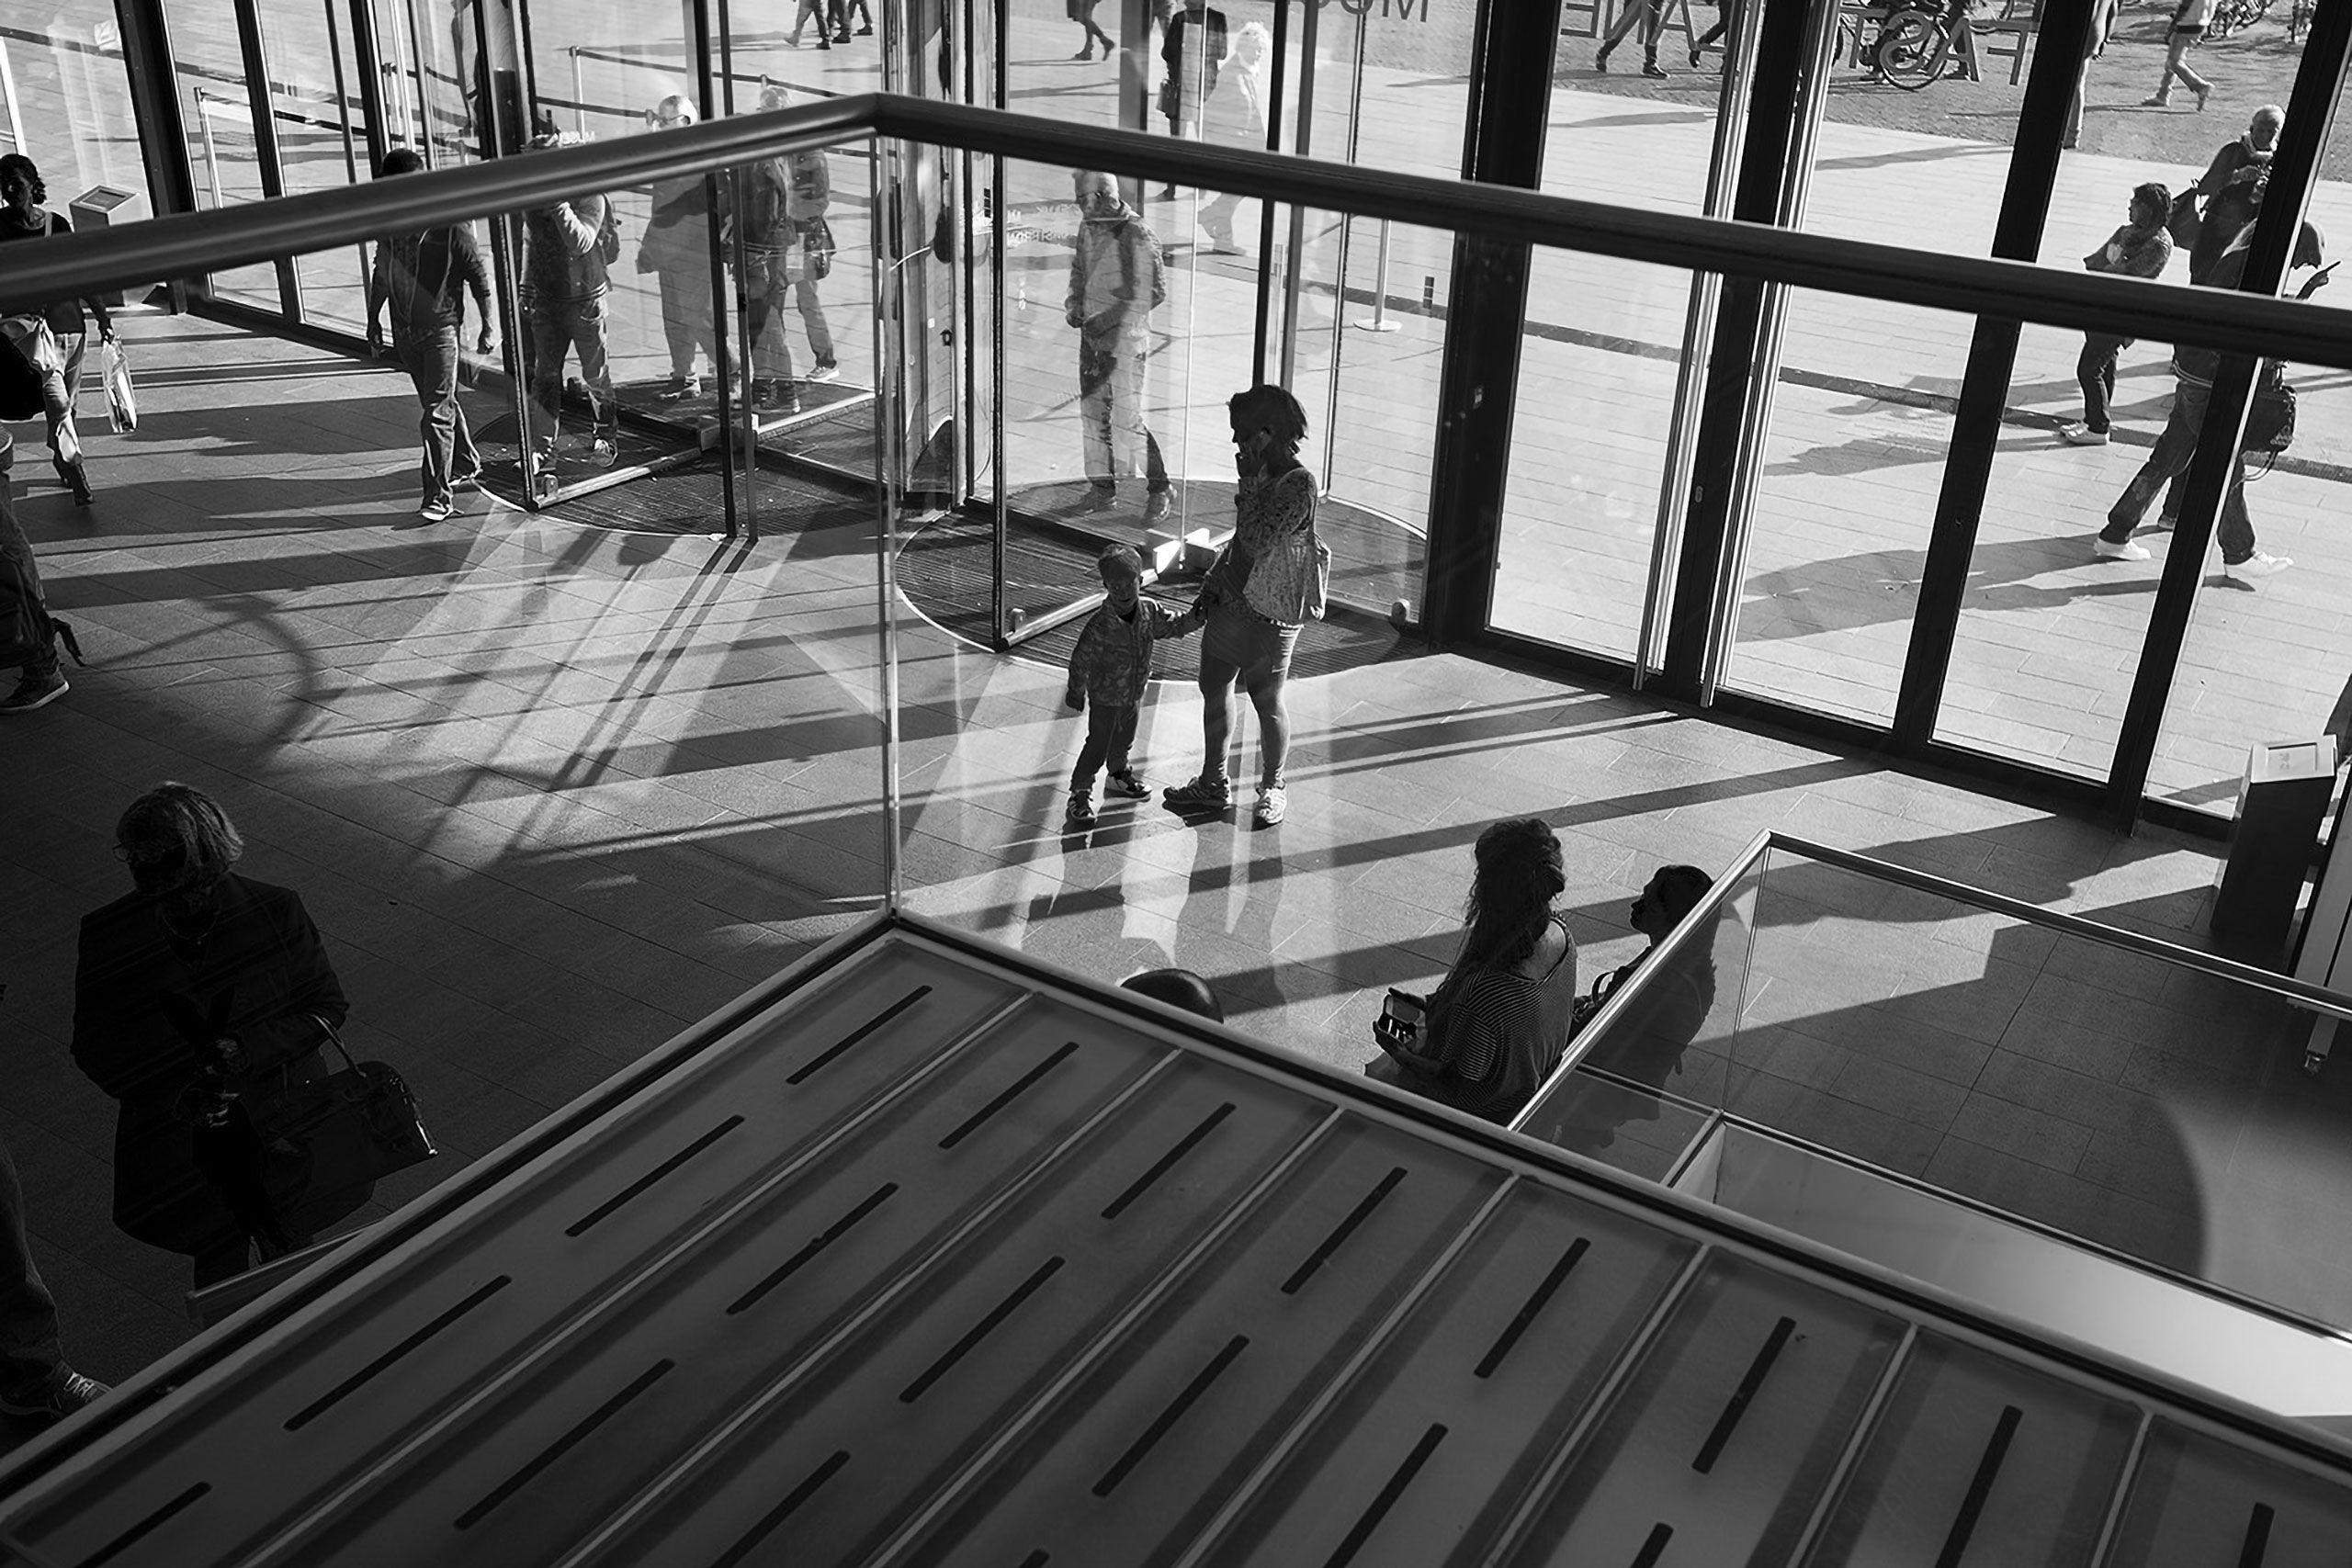 B&W of lobby Stedelijk Museum Of Modern Art Amsterdam